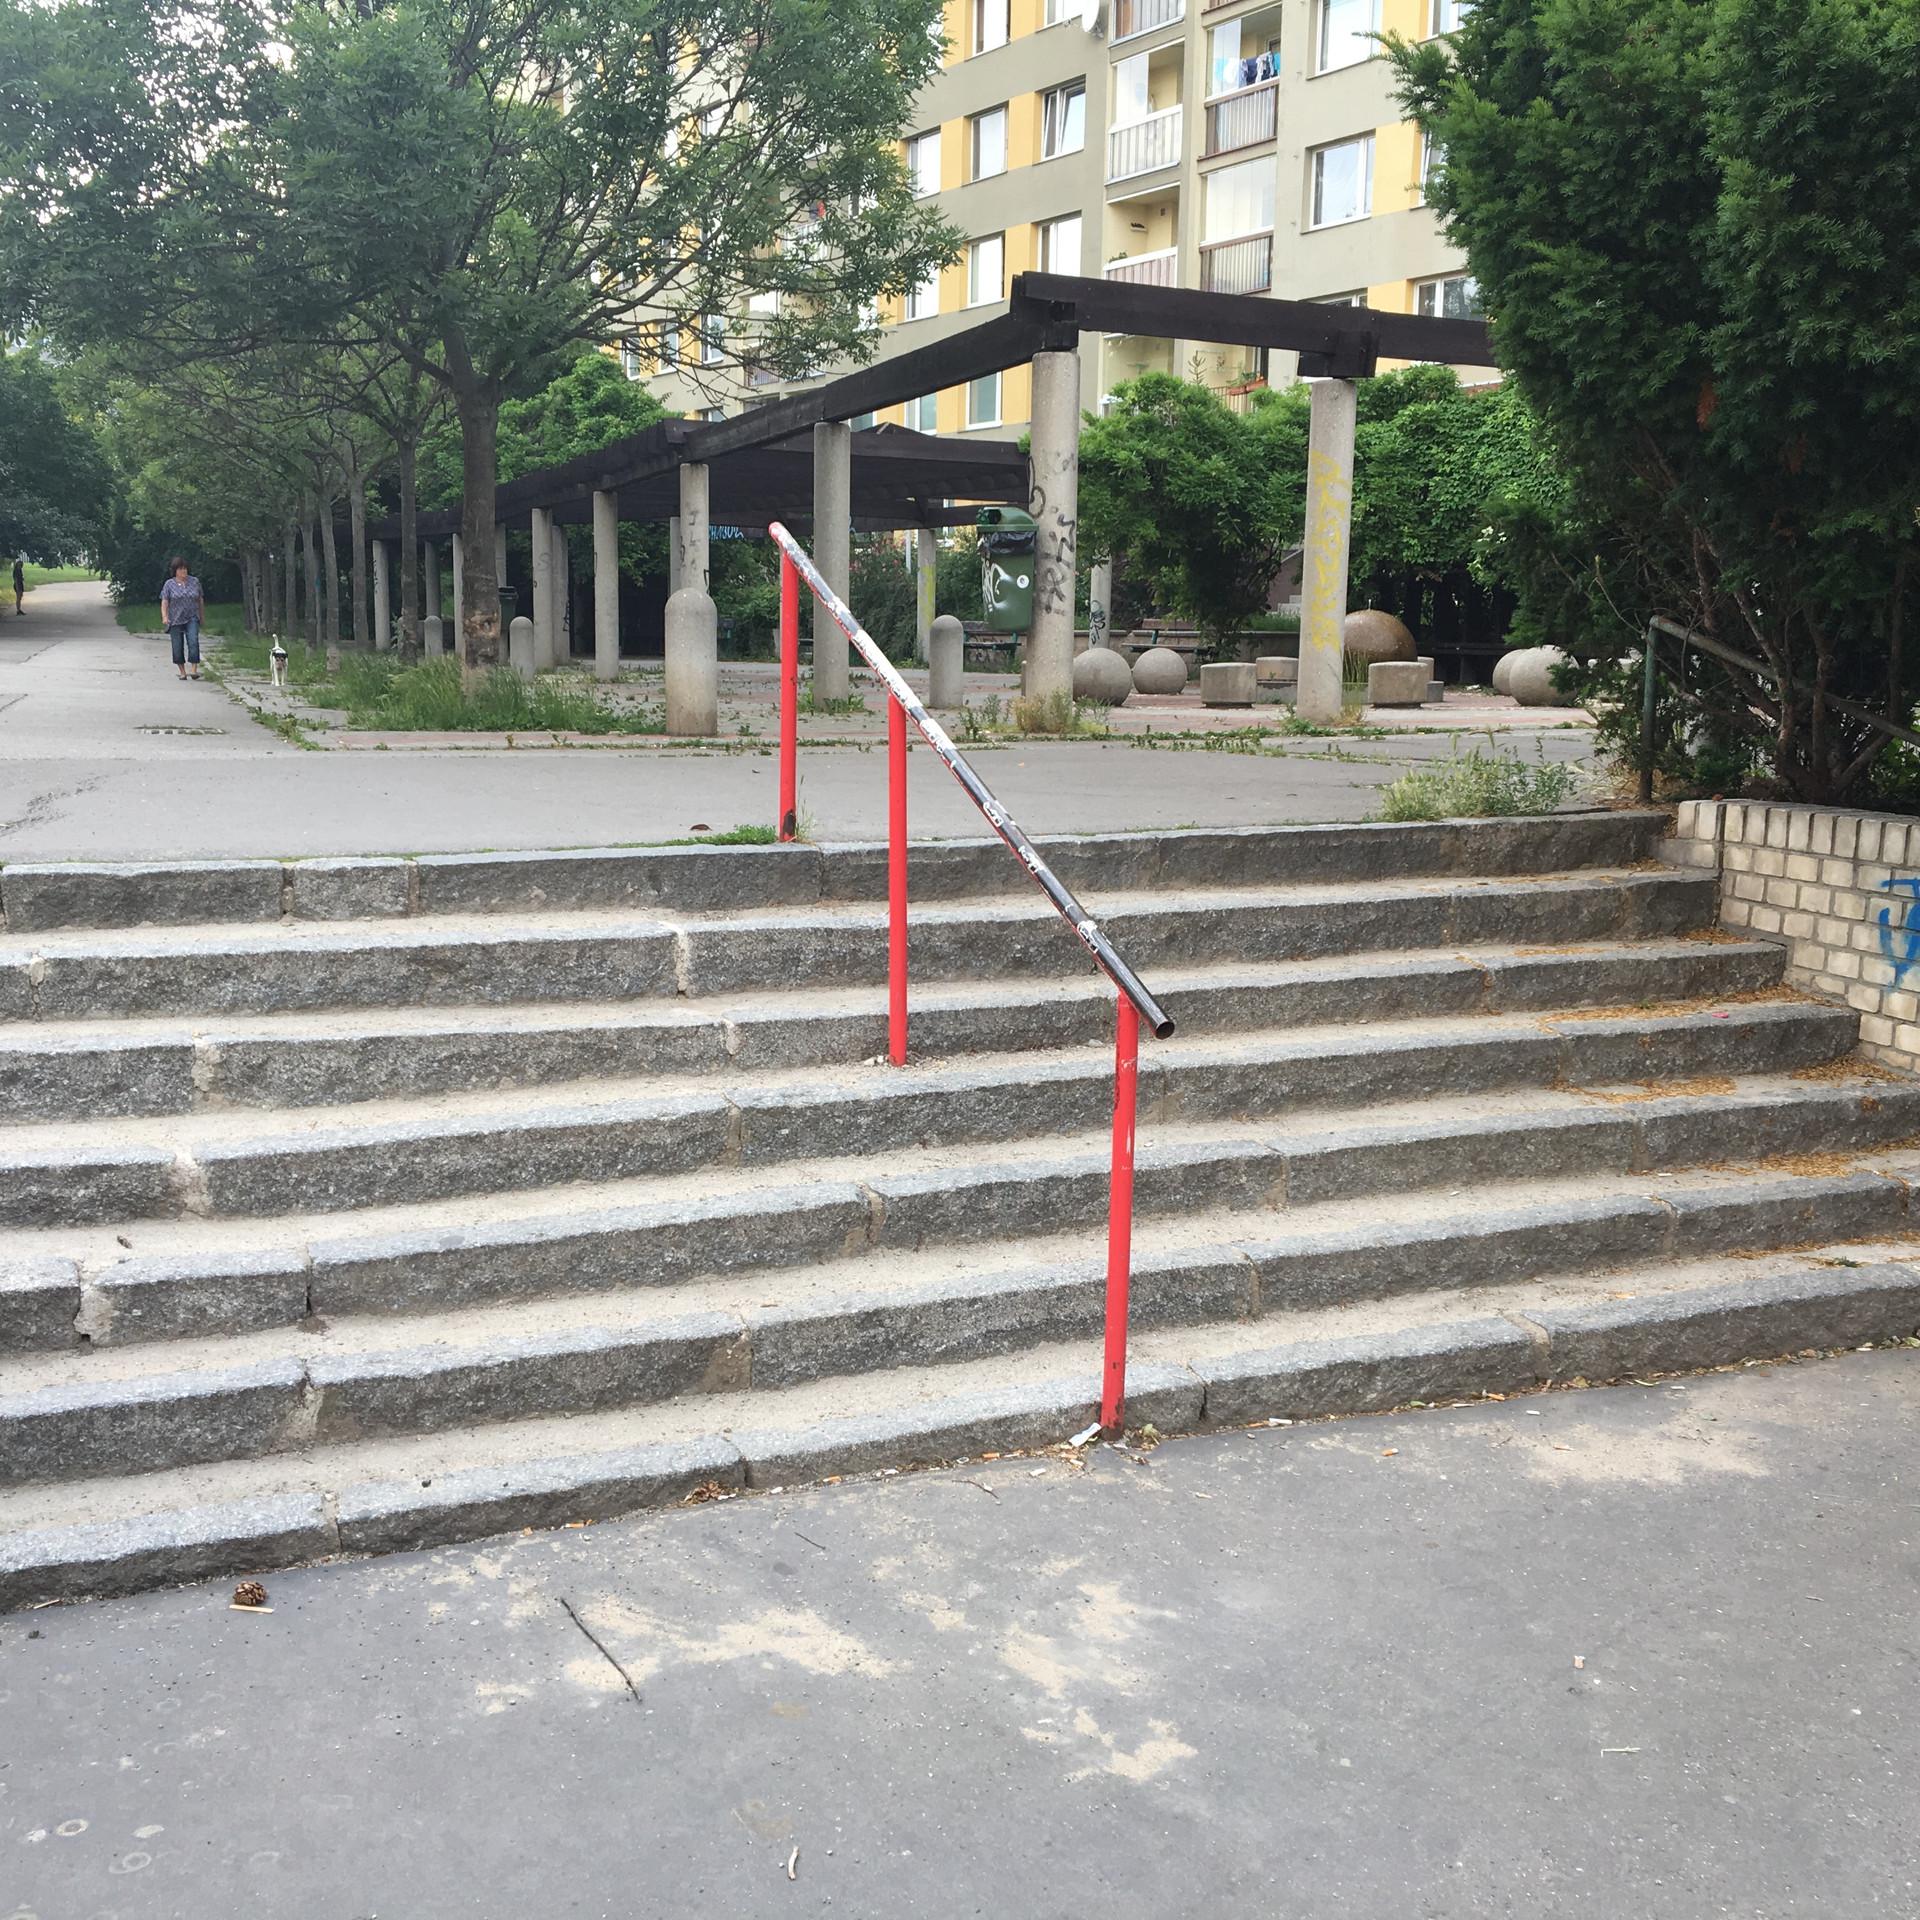 Rail 7 stairs